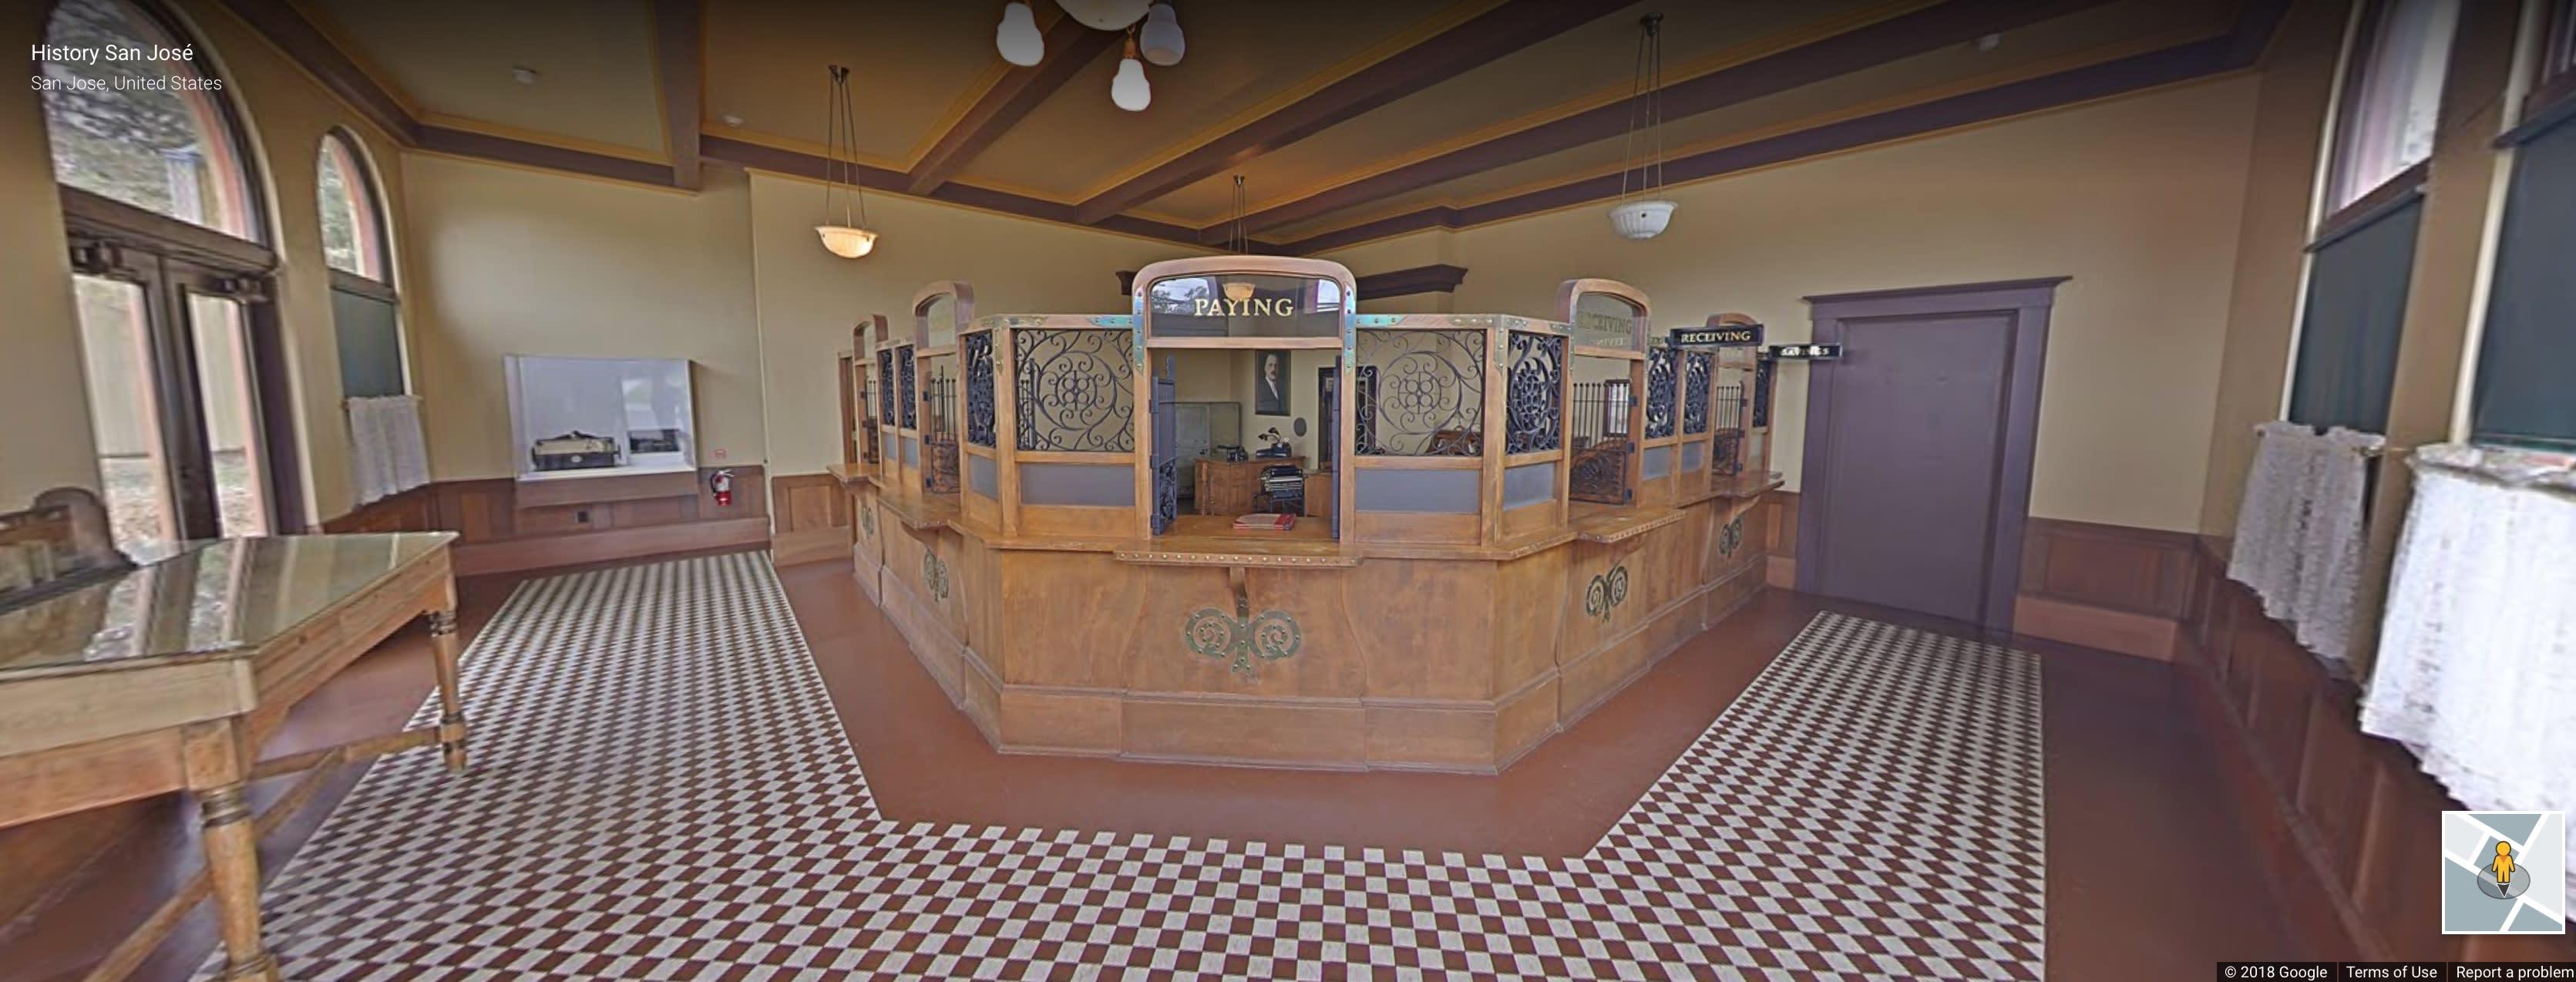 Inside a replica of an original Bank of Italy. Image credit: HistorySanJose